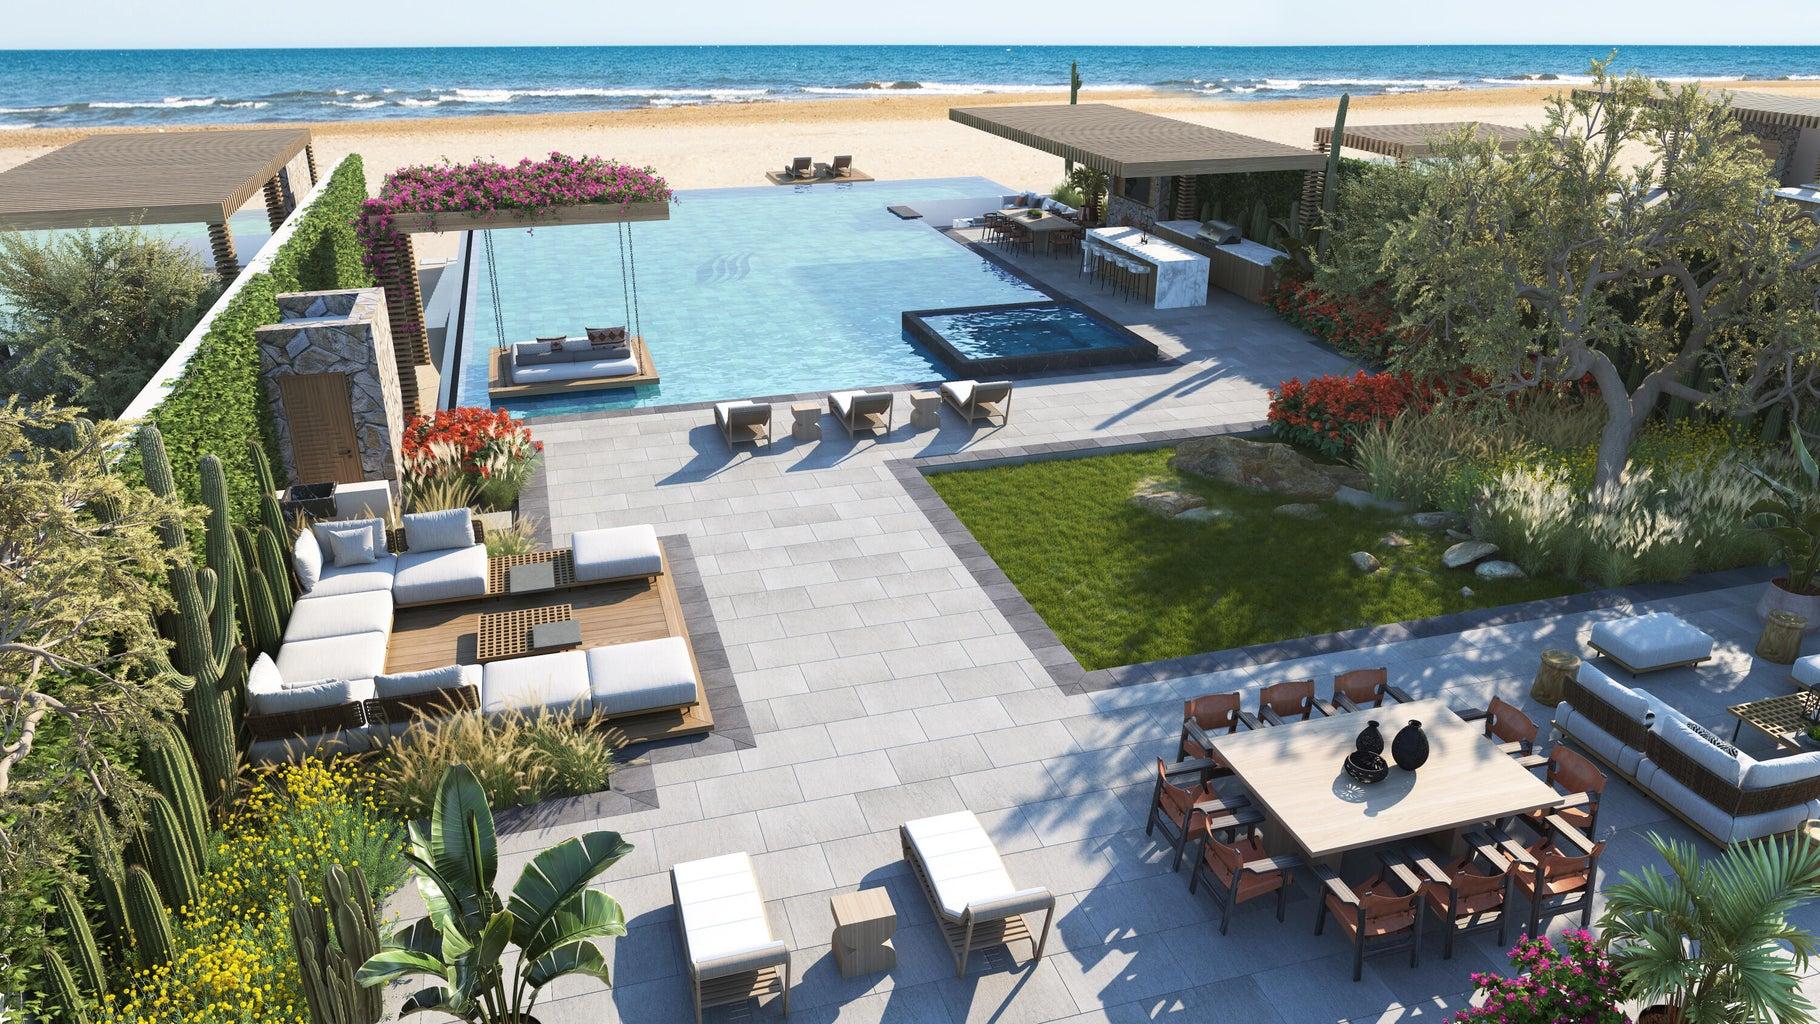 Beachfront villa terrace